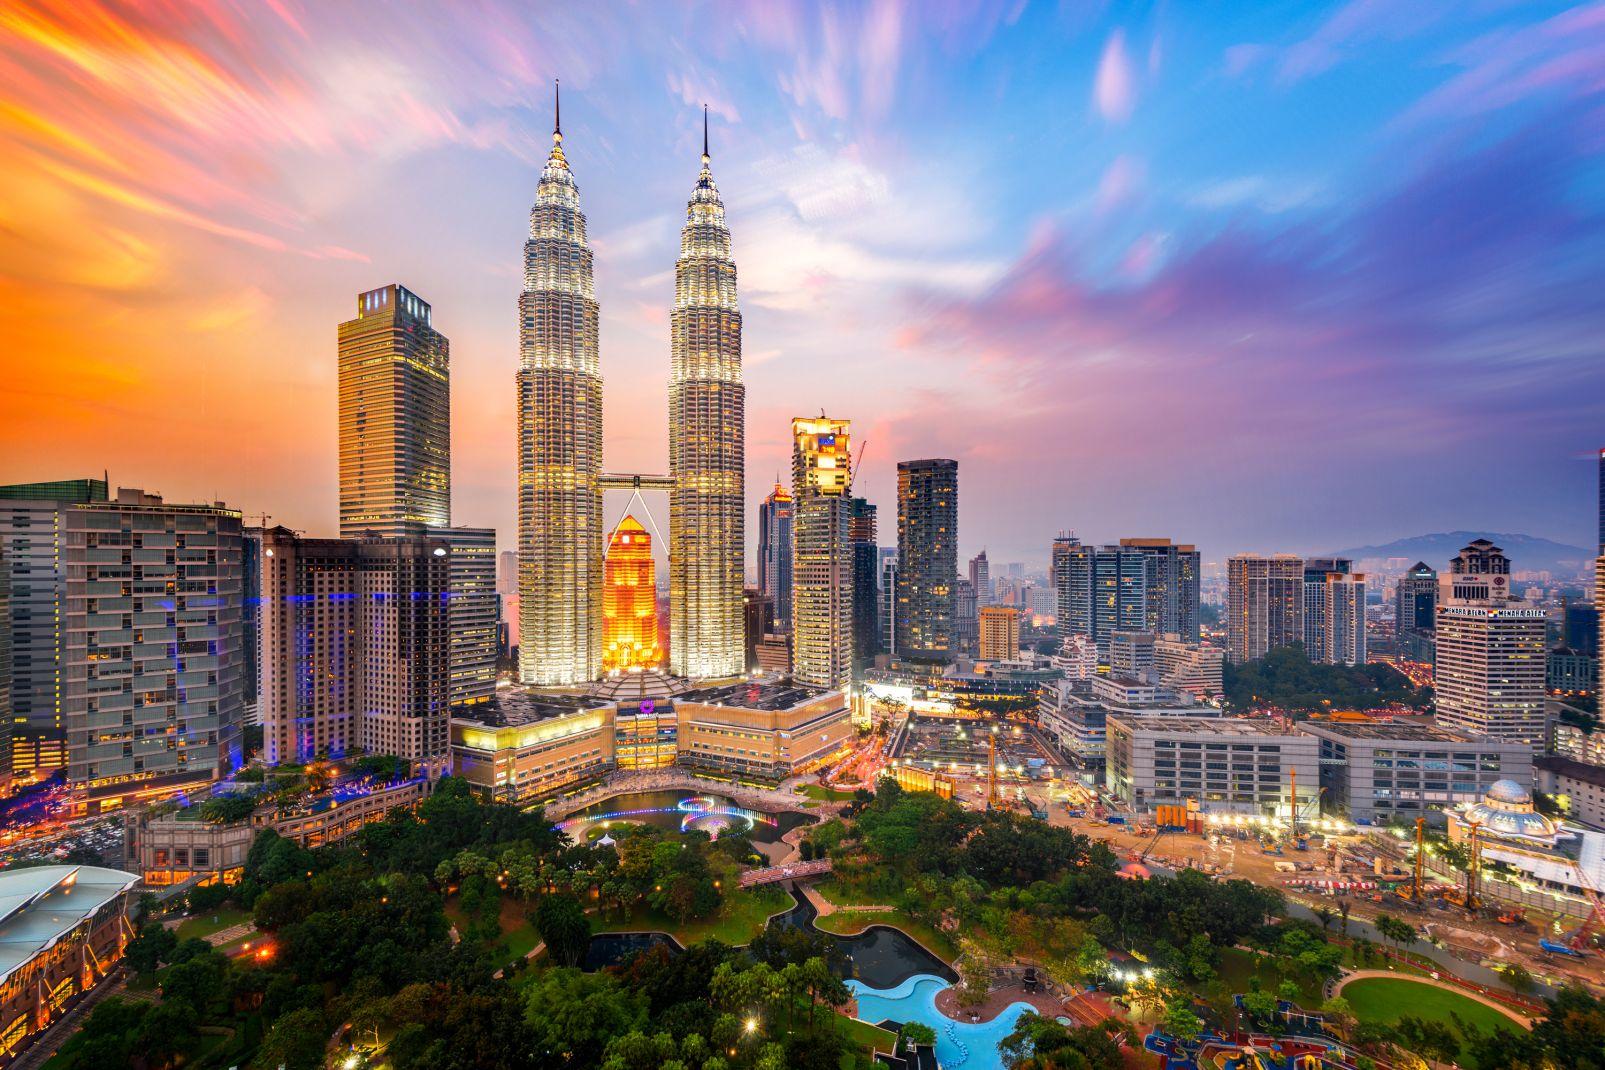 Malaisie occidentale, Malaisie